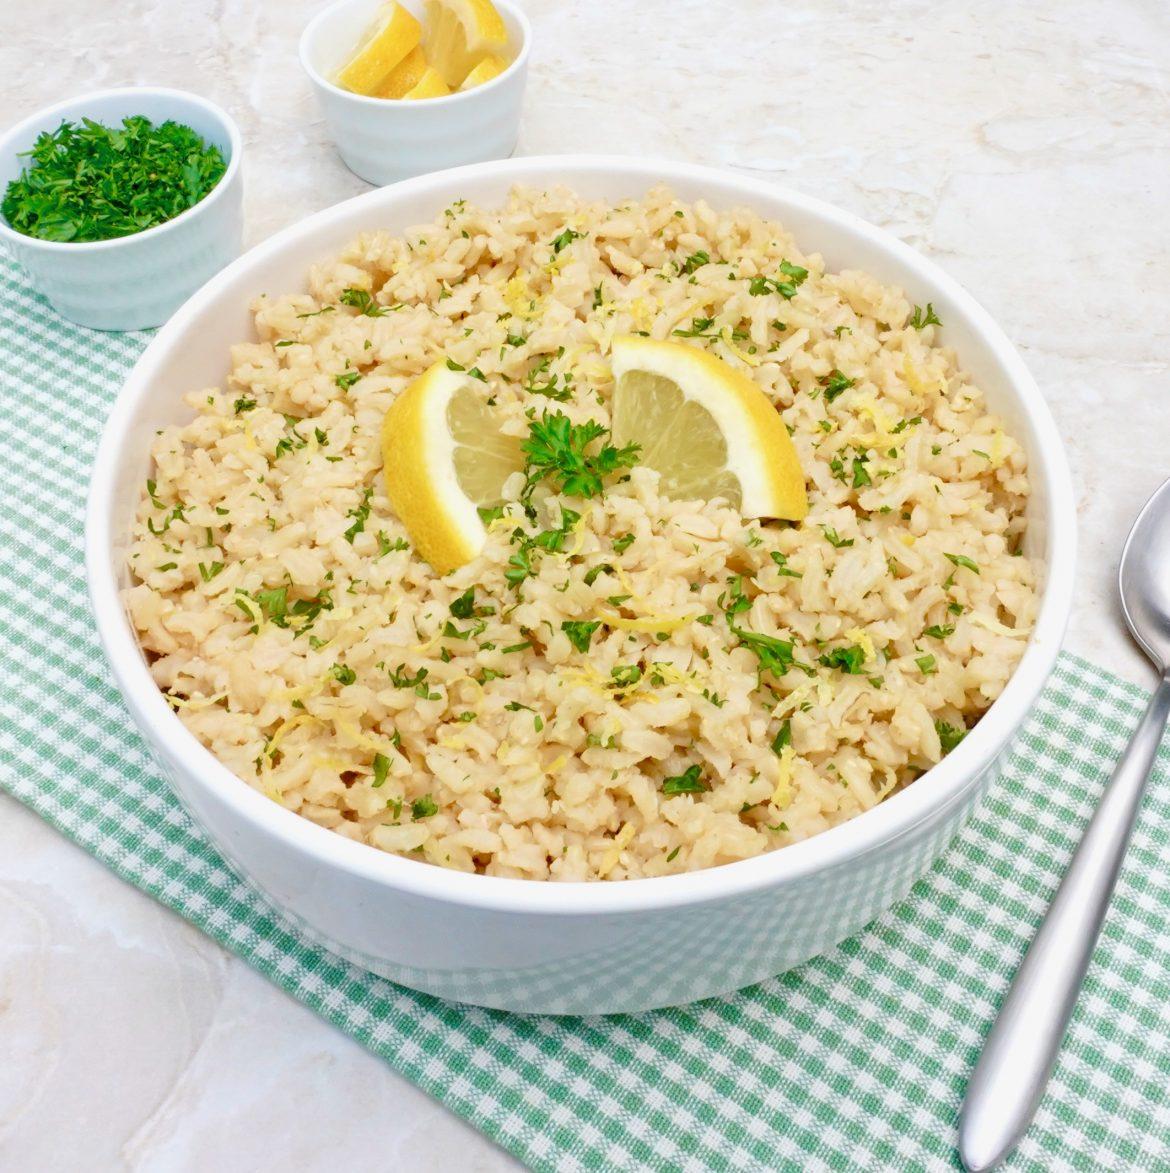 Lemon Parsley Brown Rice